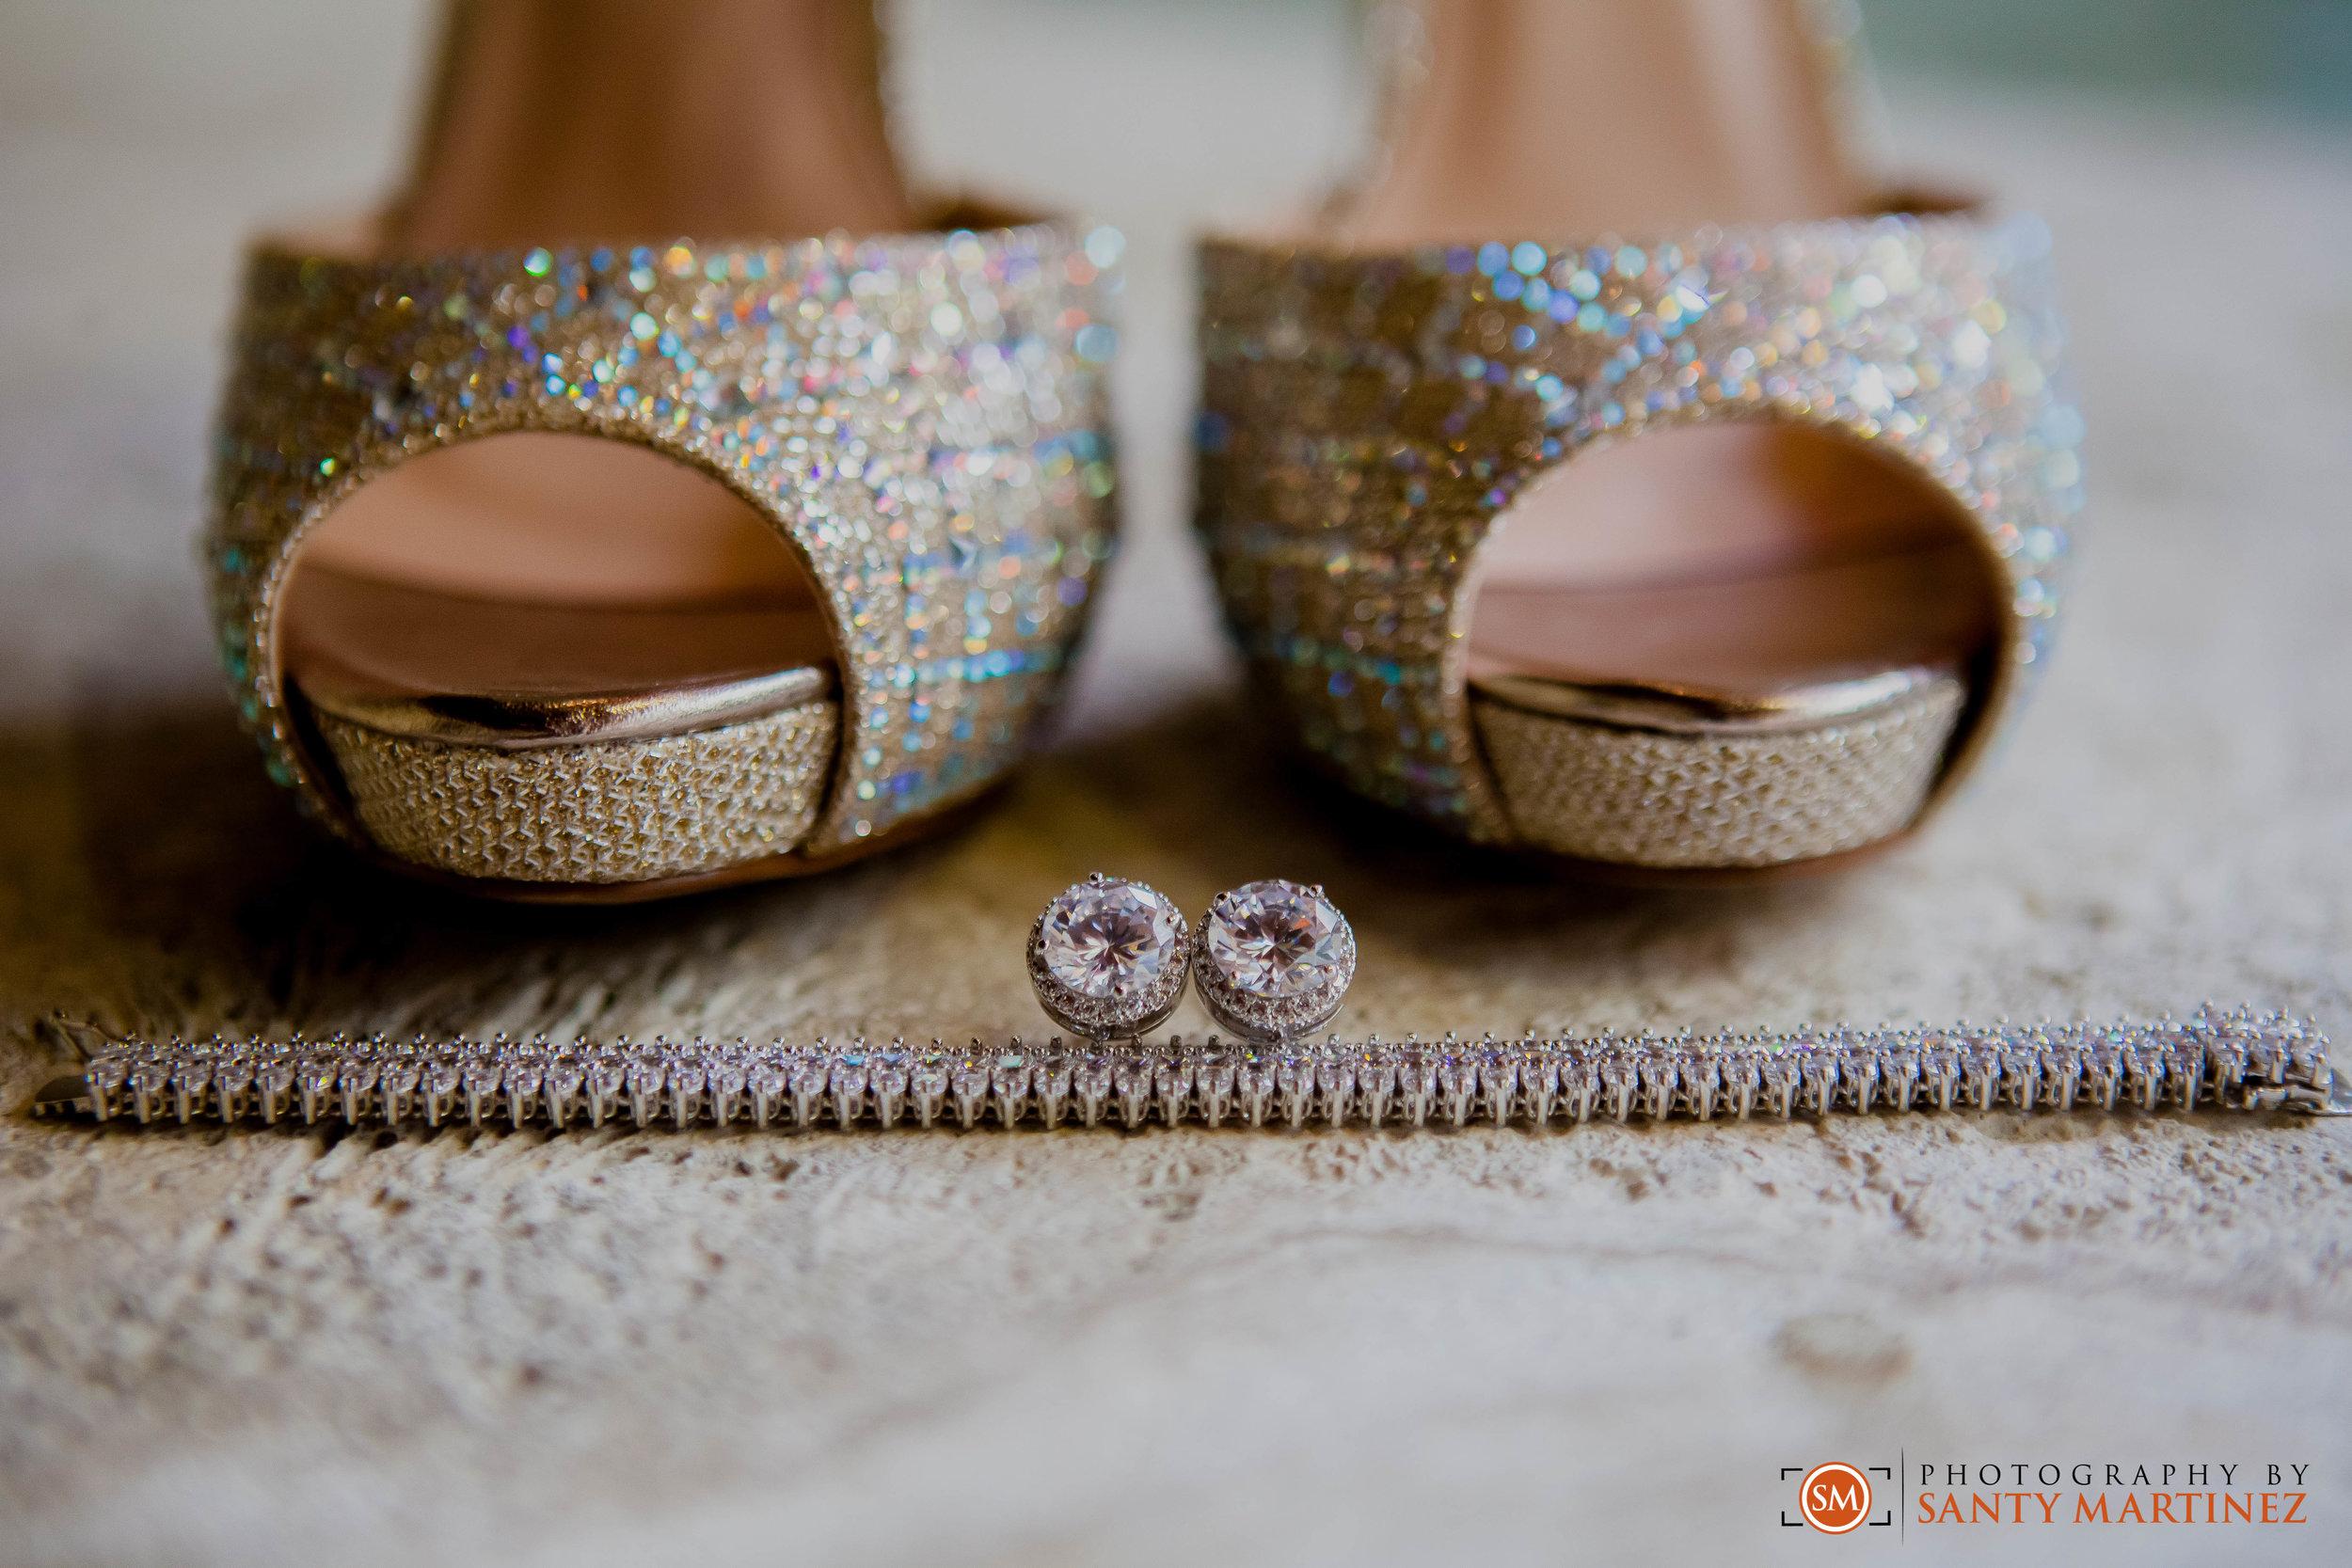 Wedding Douglas Entrance - Photography by Santy Martinez-3.jpg